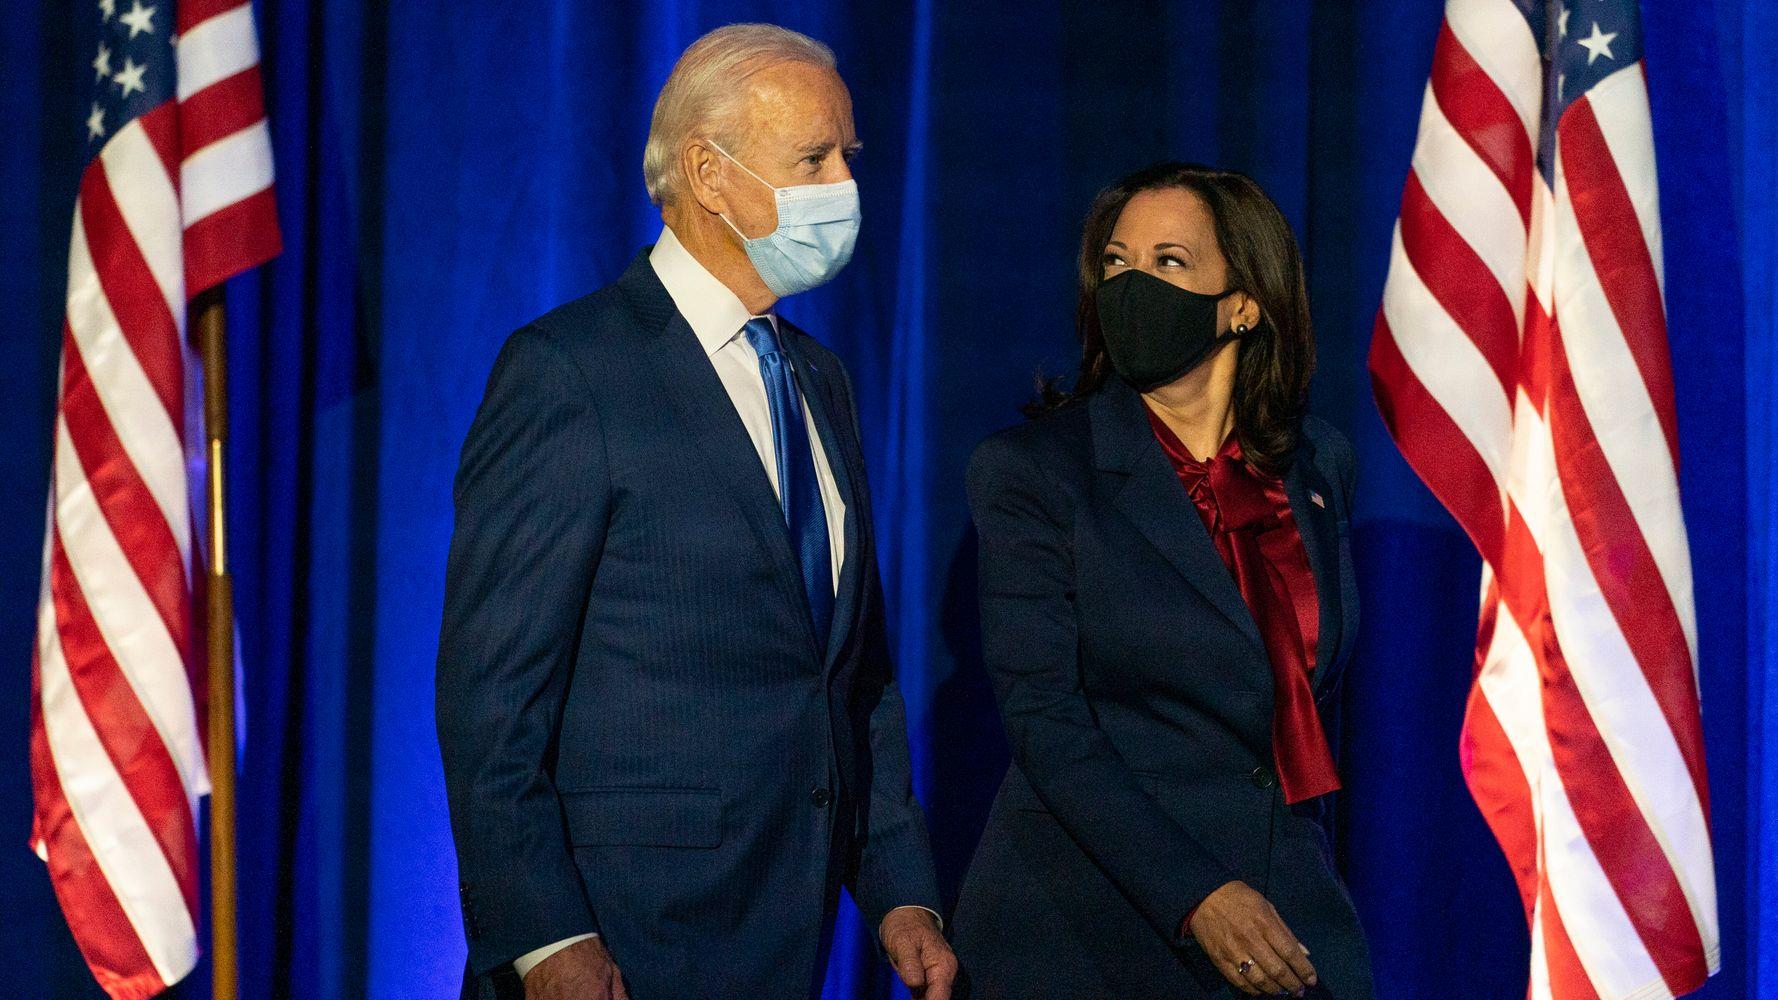 Biden Transition Team Get To Work Amid Election Limbo